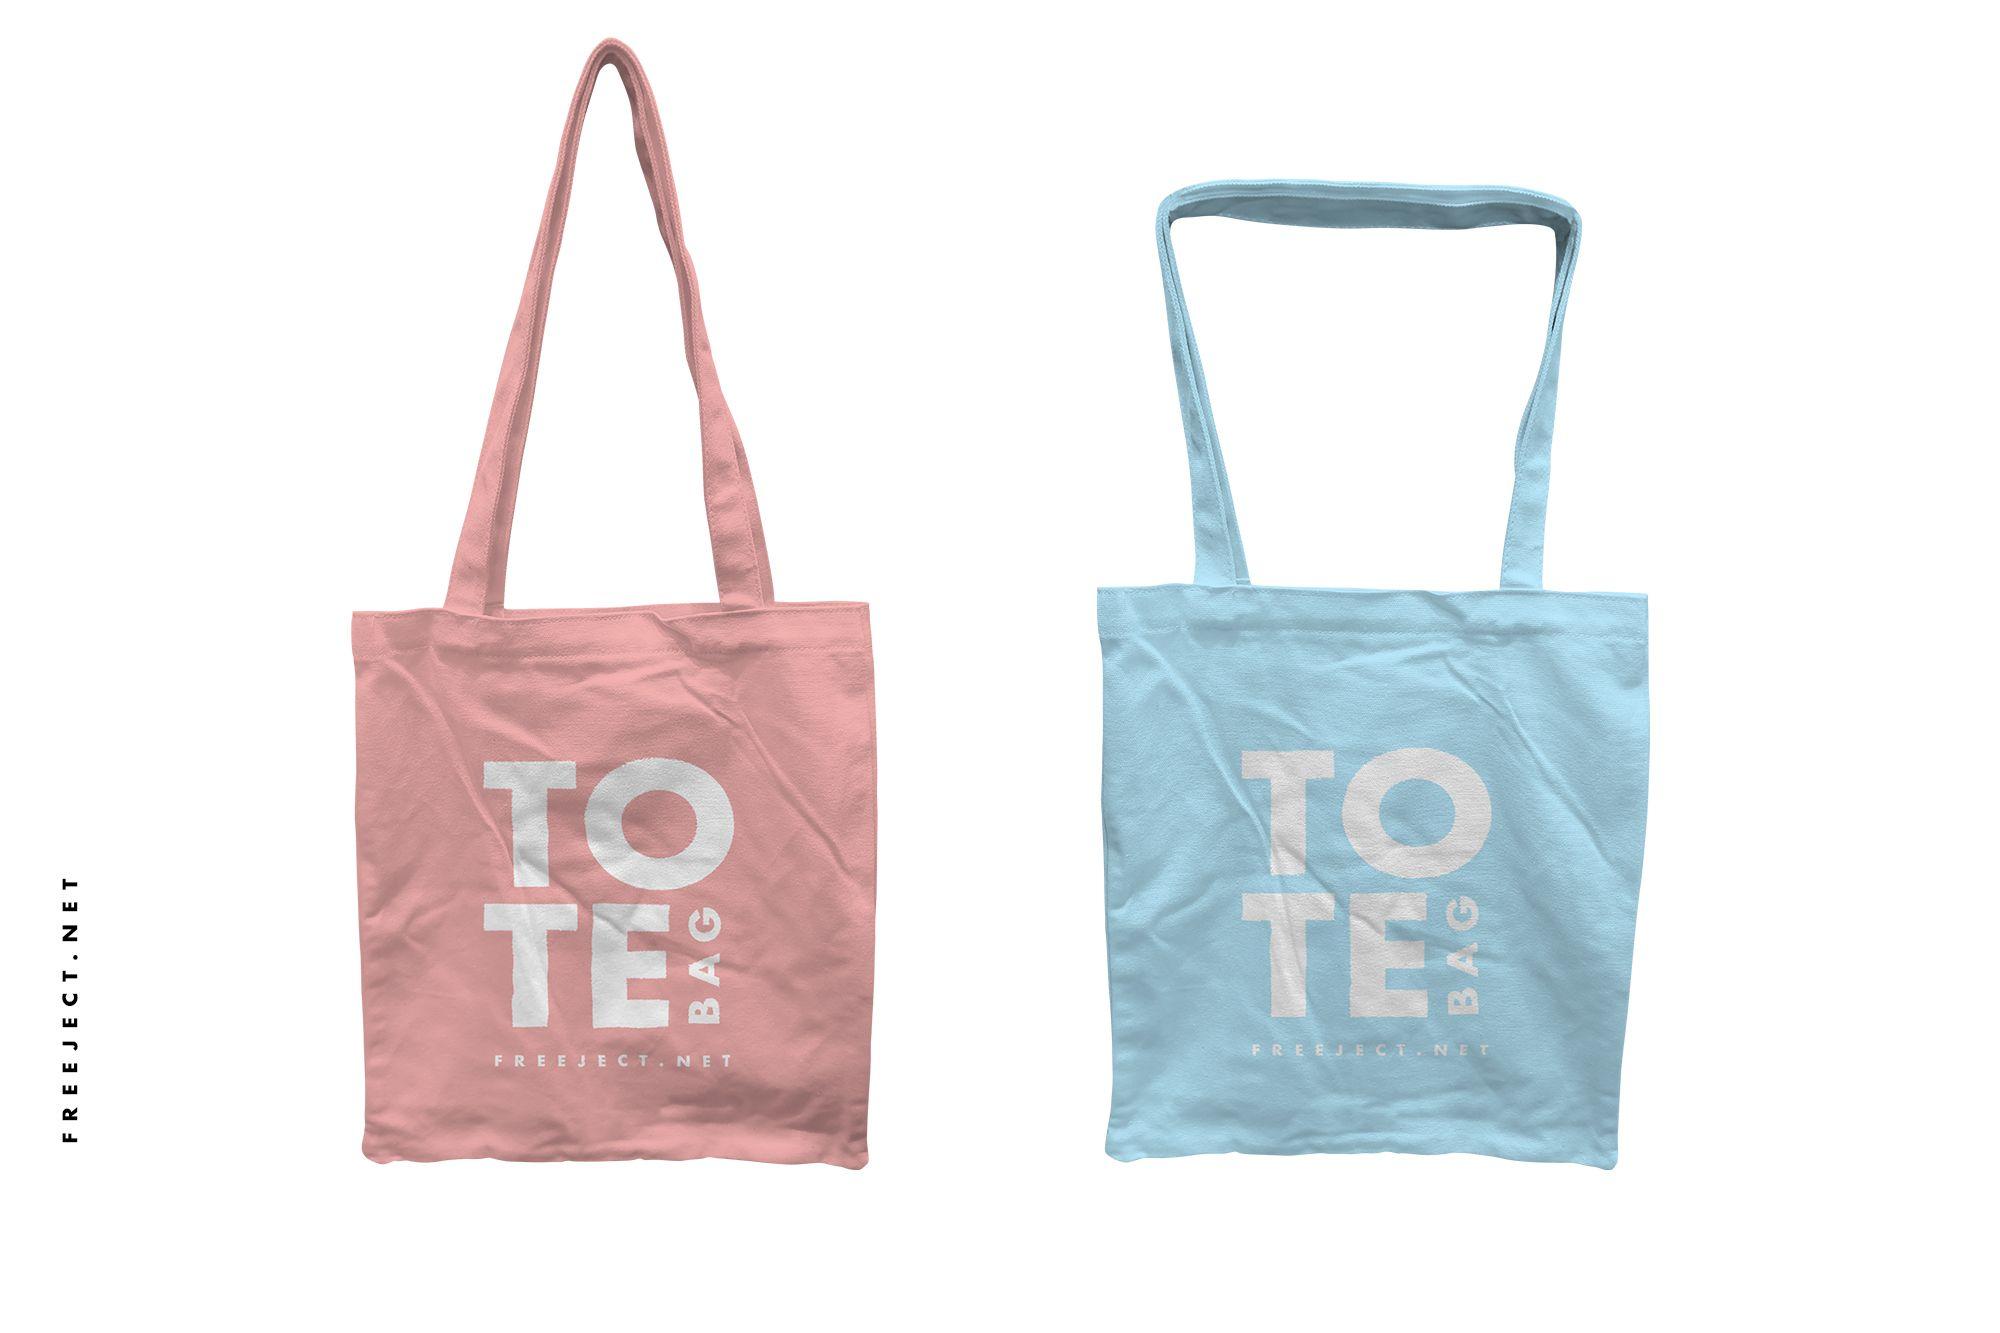 Download Free Download Tote Bag Mockup For Design Template Psd File Bag Mockup Tote Bag Free Tote